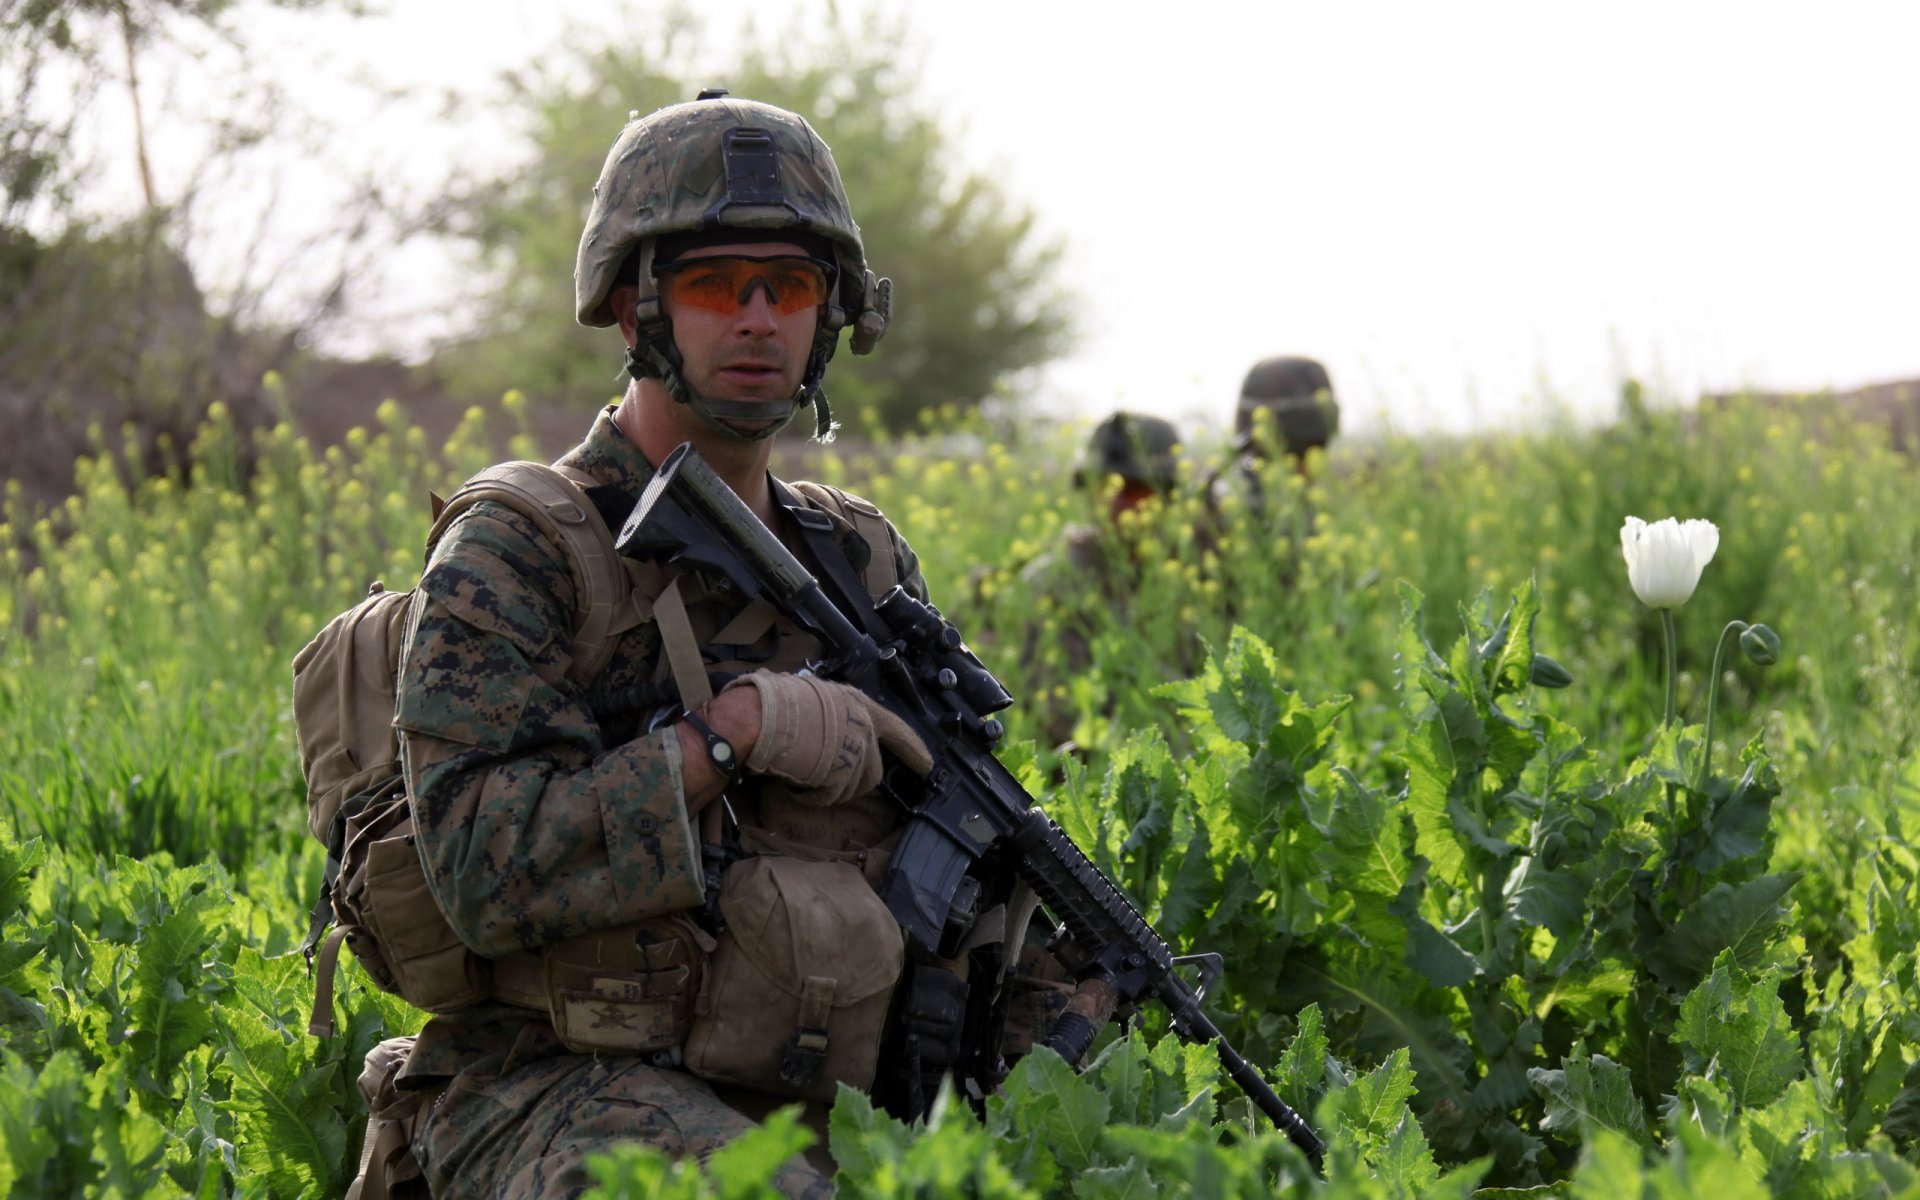 армия солдаты военные картинки это